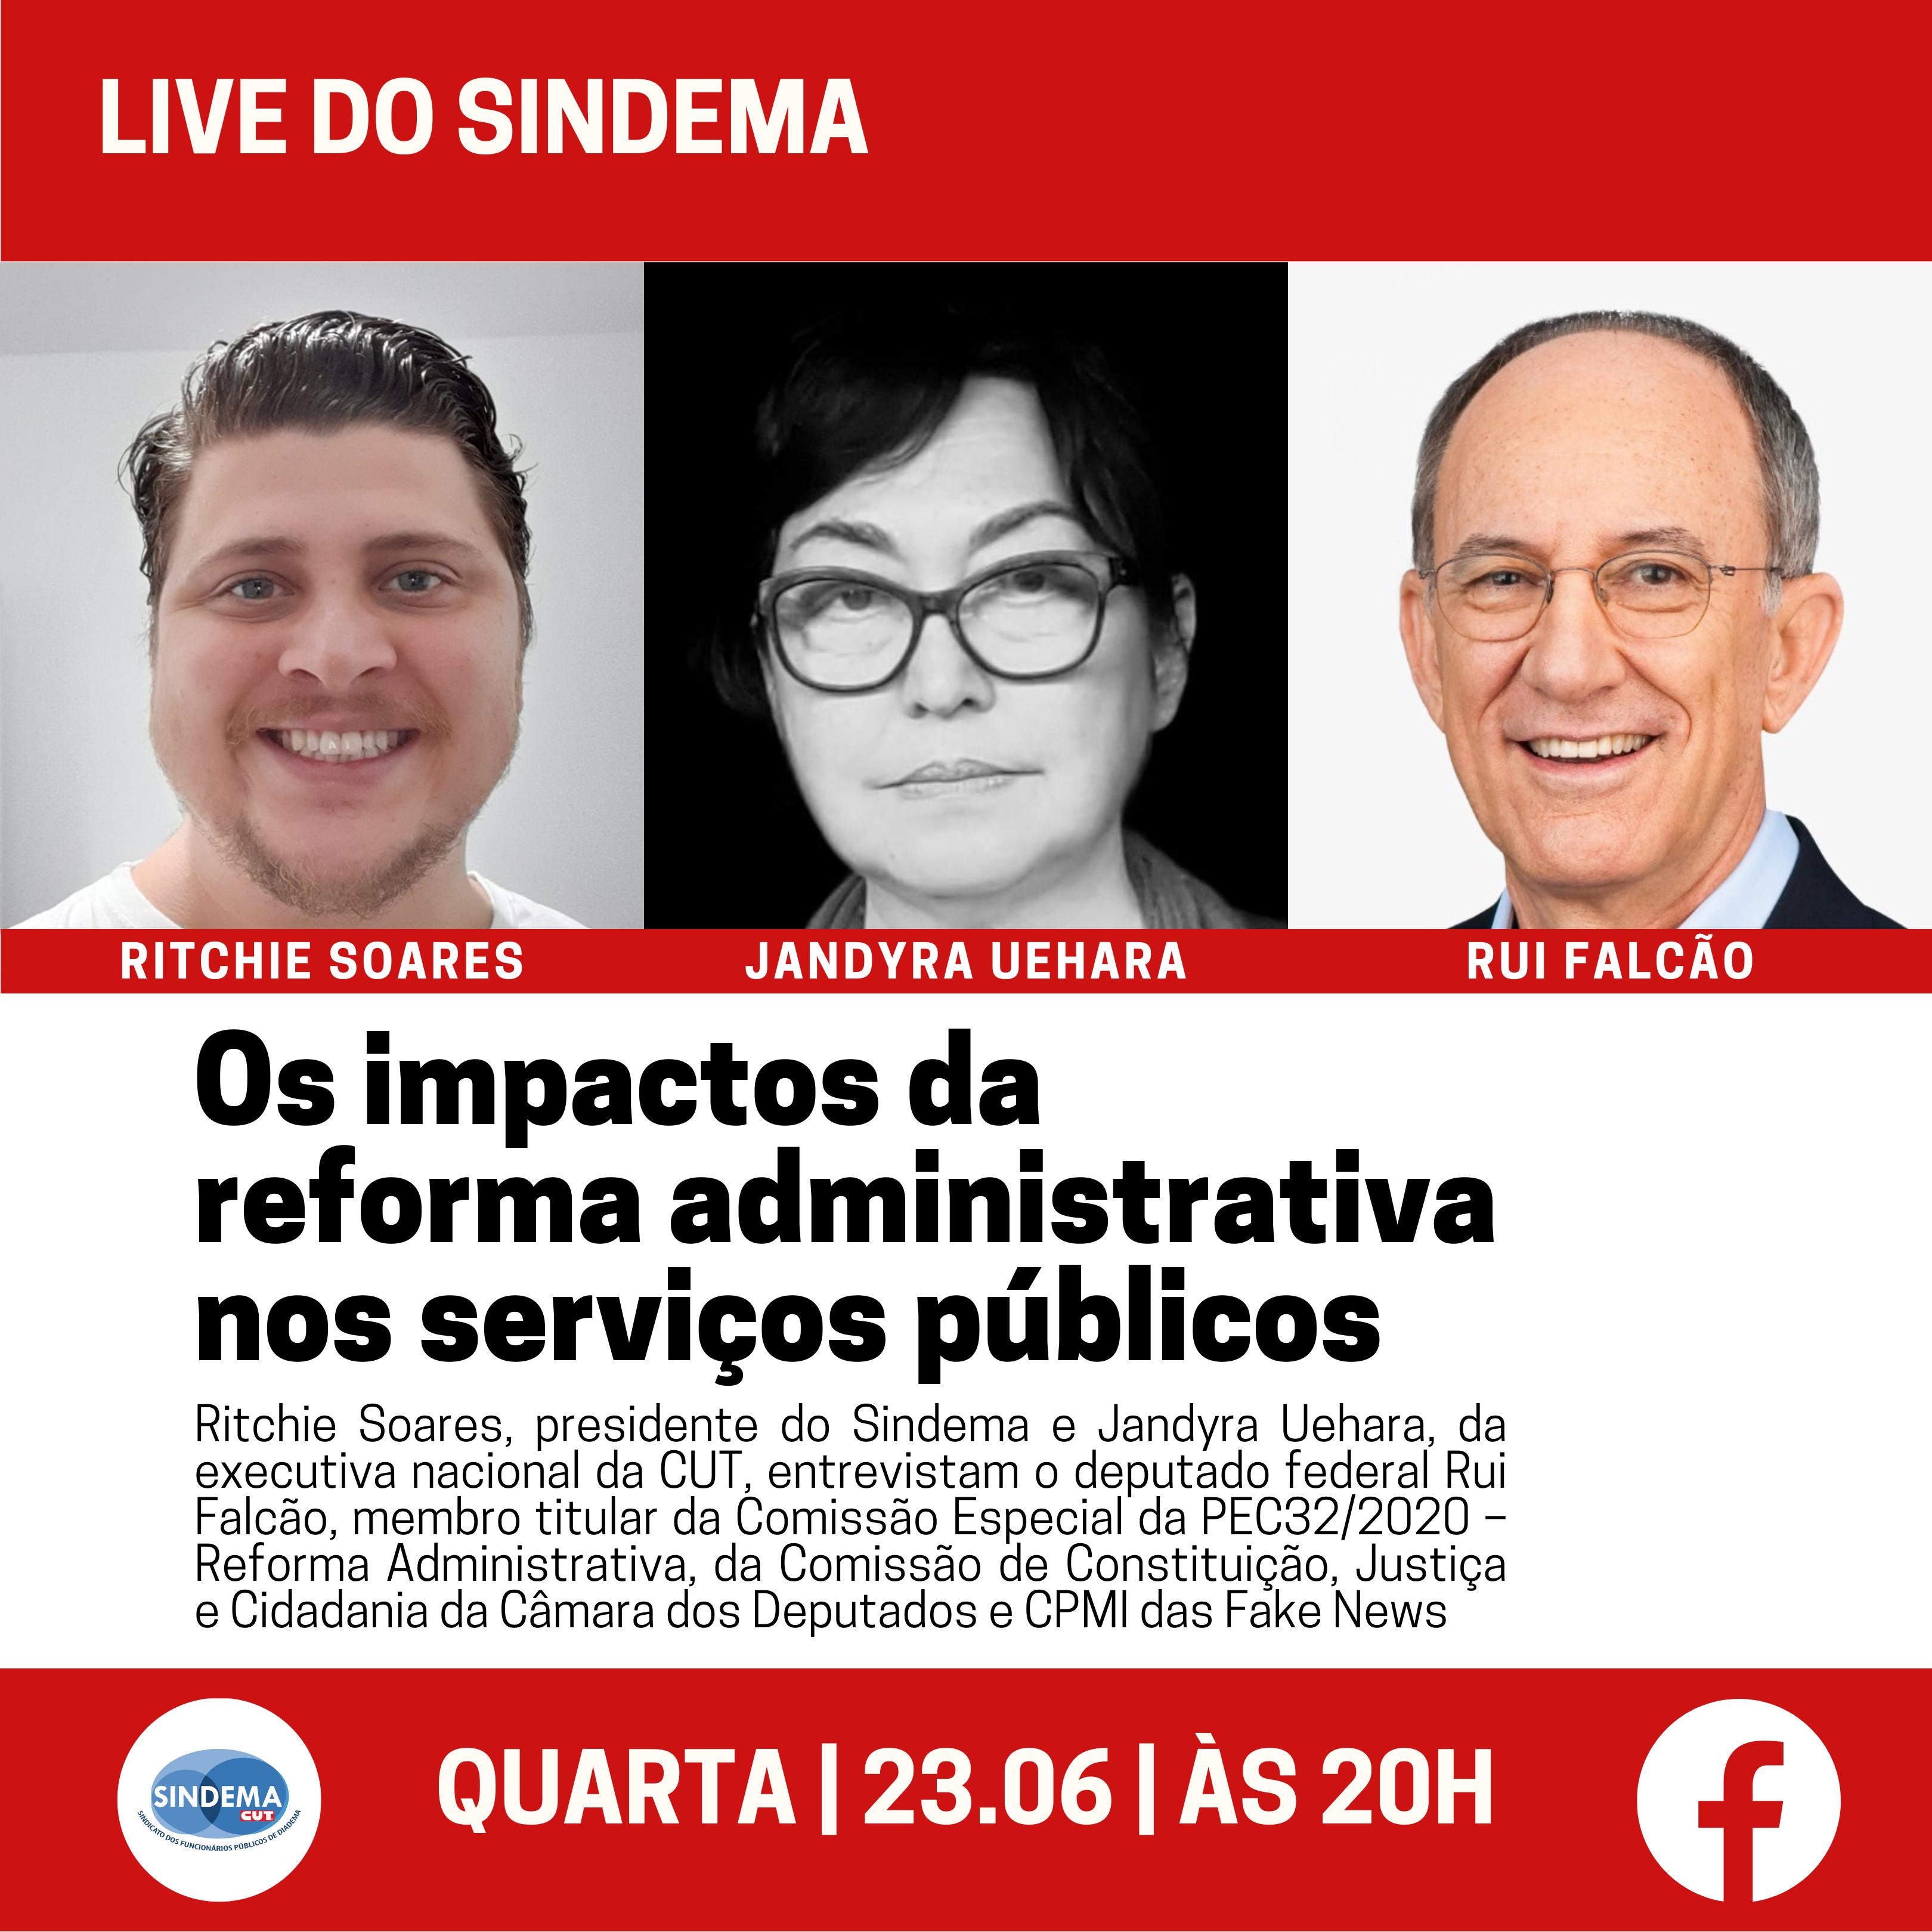 Live do Sindema